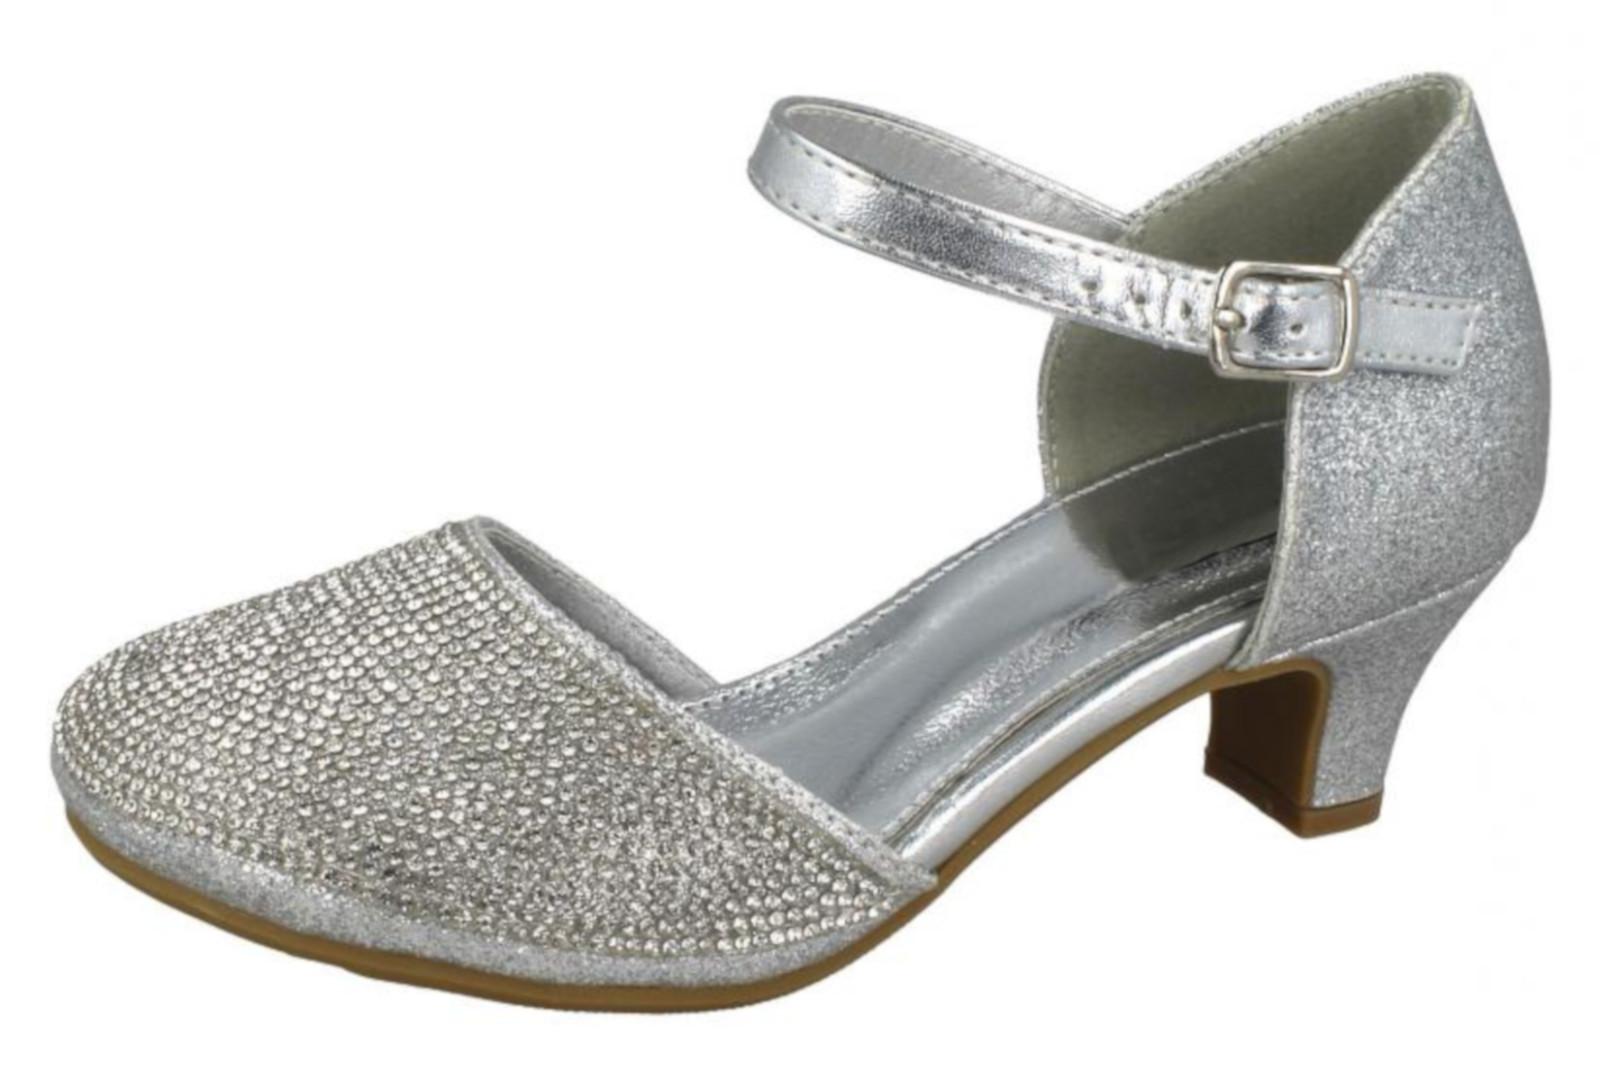 1261e82120d7 Kids Girls Mary Jane Party Shoes Diamante Glitter Bridesmaids ...